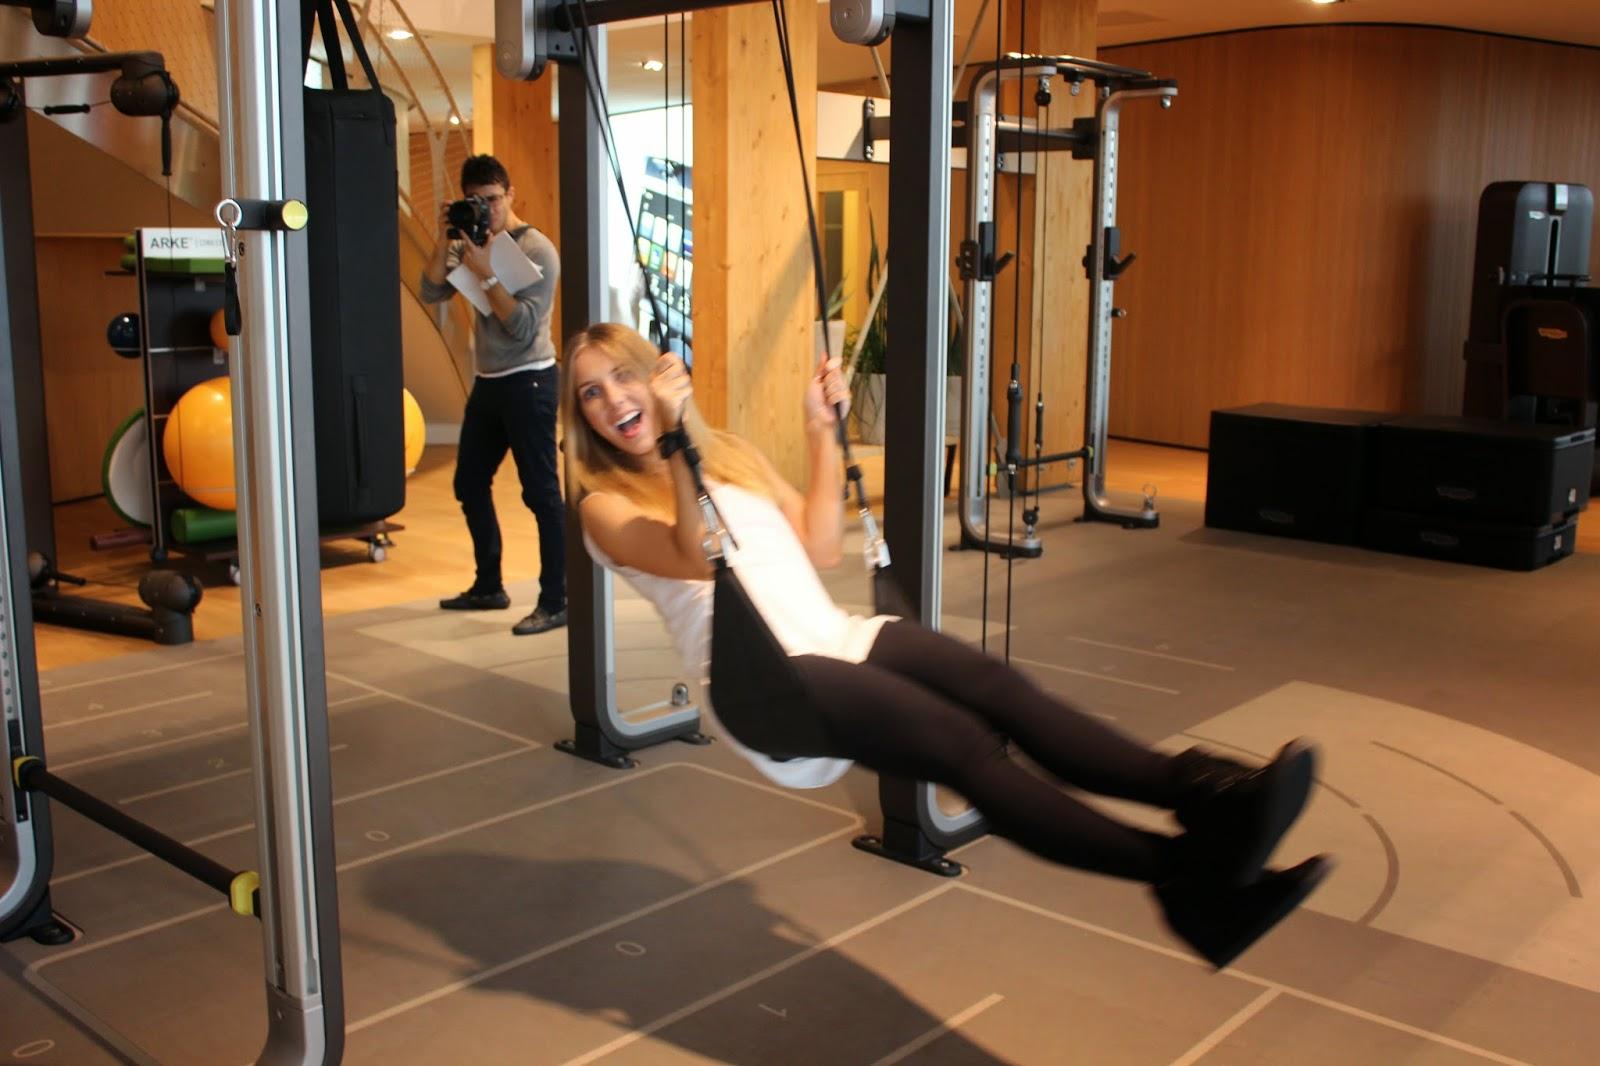 Technogym Wellness Village Gym Showroom Natalie Omnia